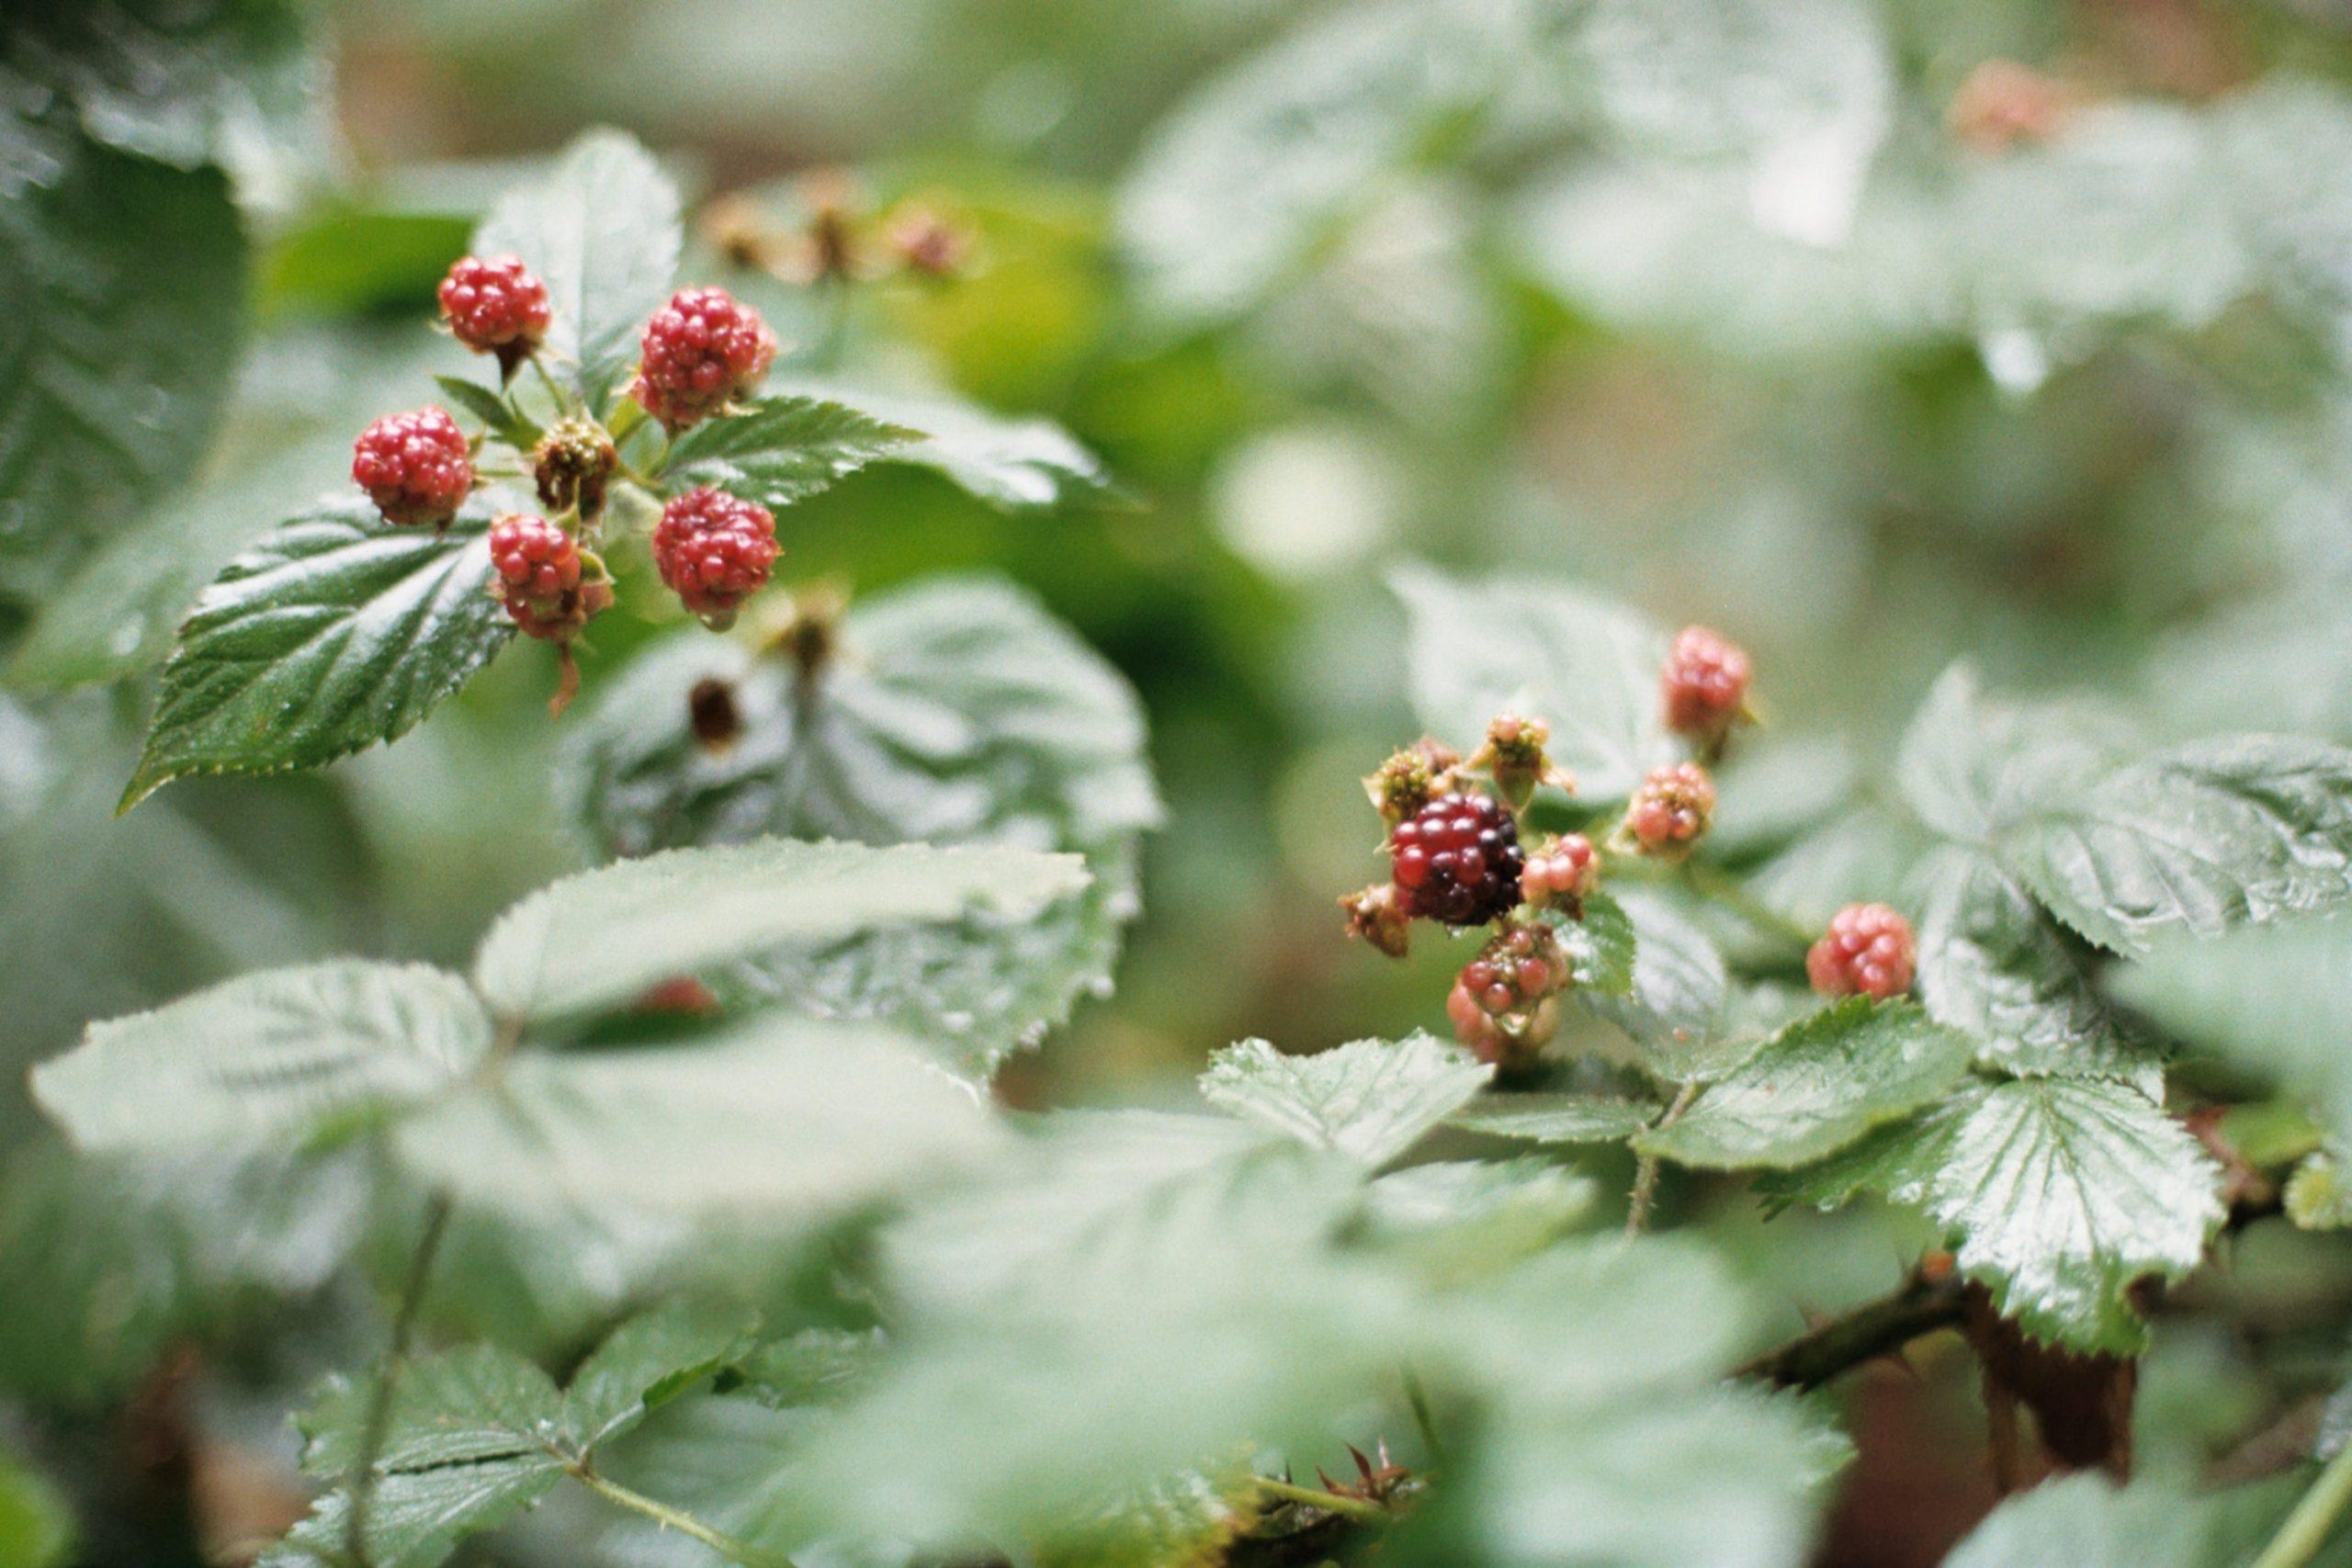 raspberry leaf in a field